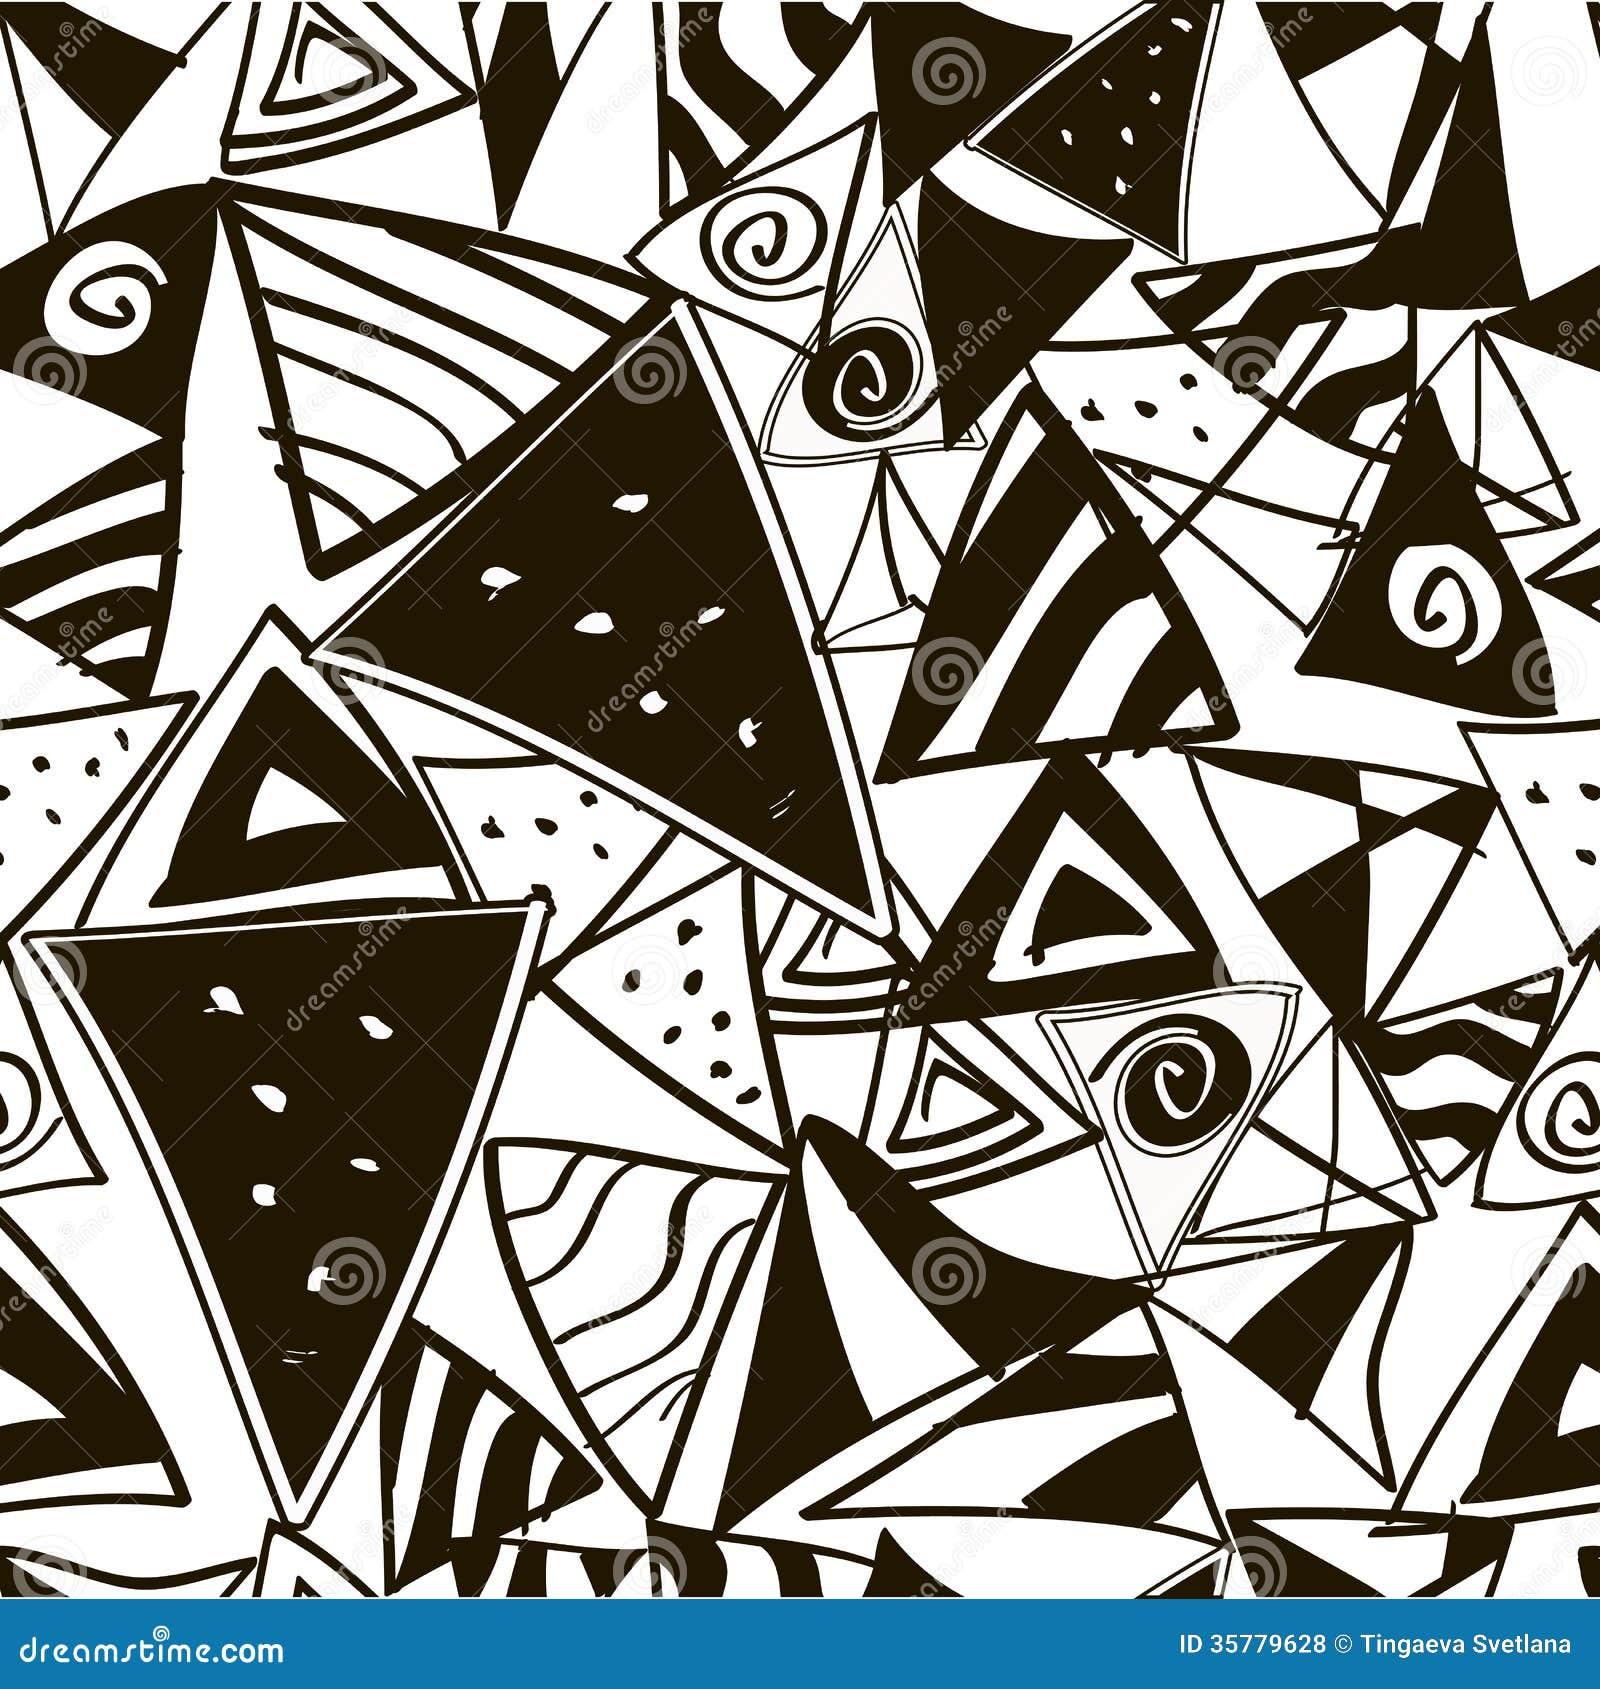 make eate chalkboard papers for printables invites make eate freebie pinterest paper printable and black